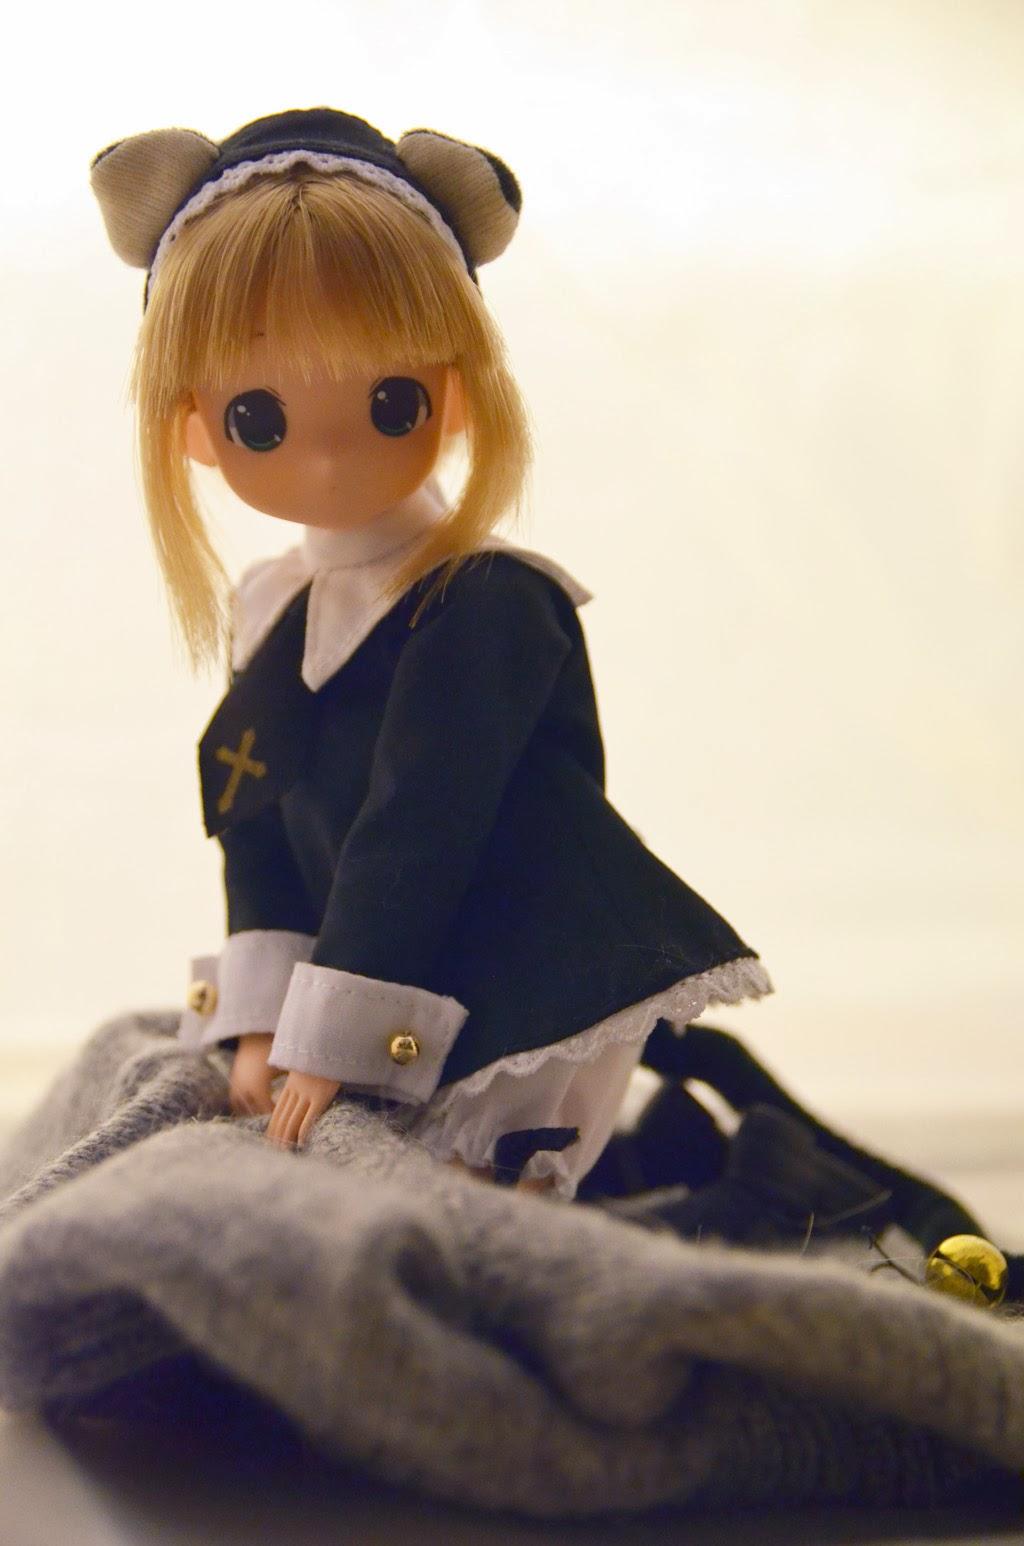 moko-chan doll